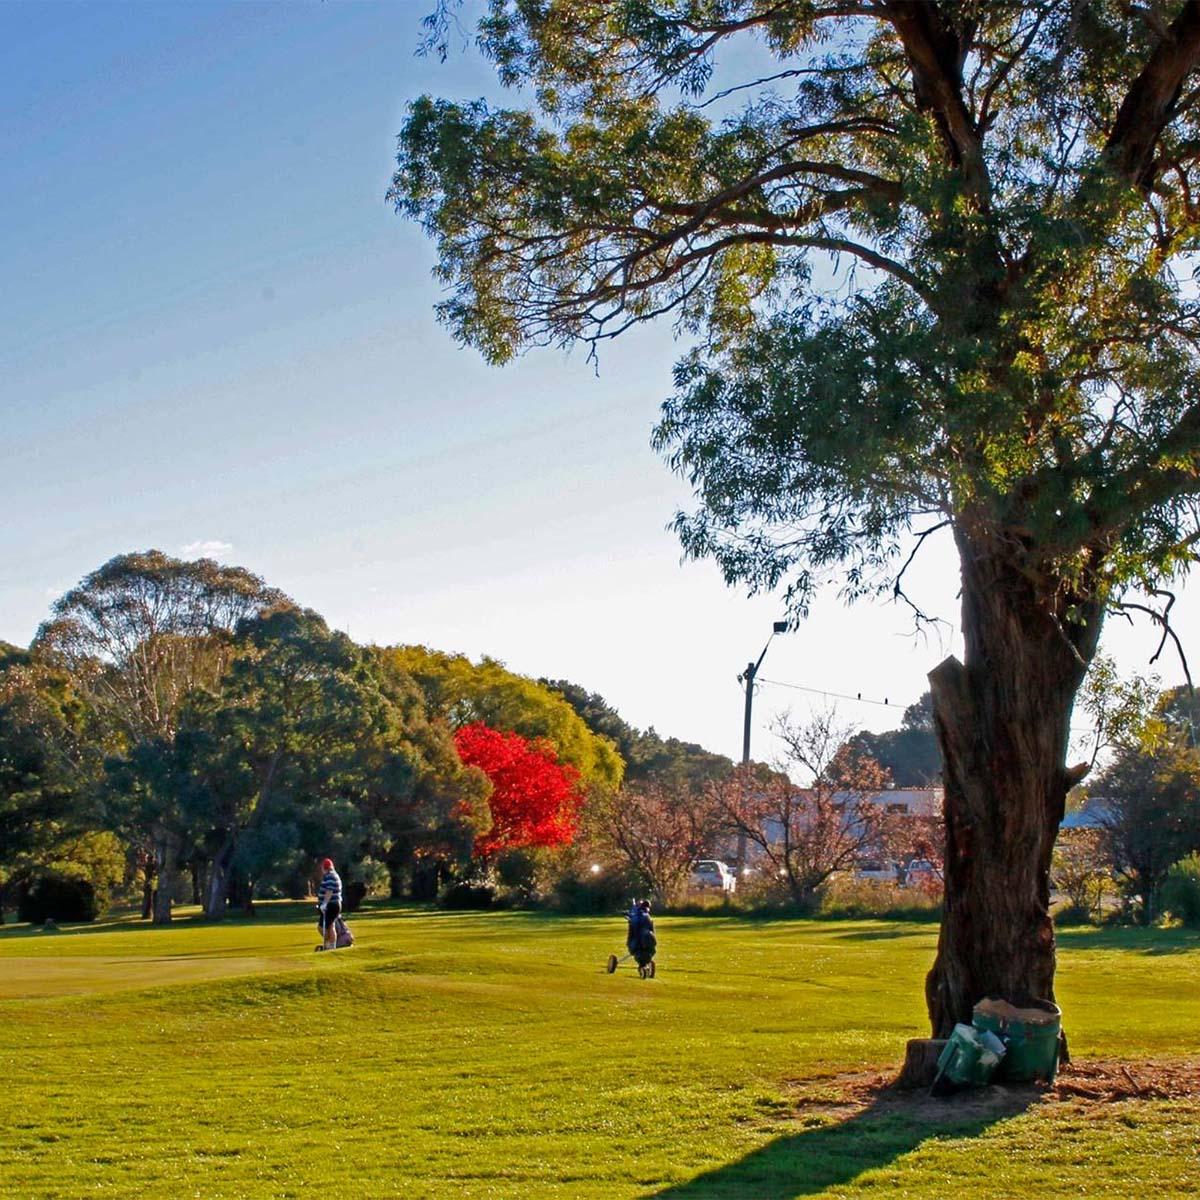 scenery around the Braidwood Servicemens Club Golf Course